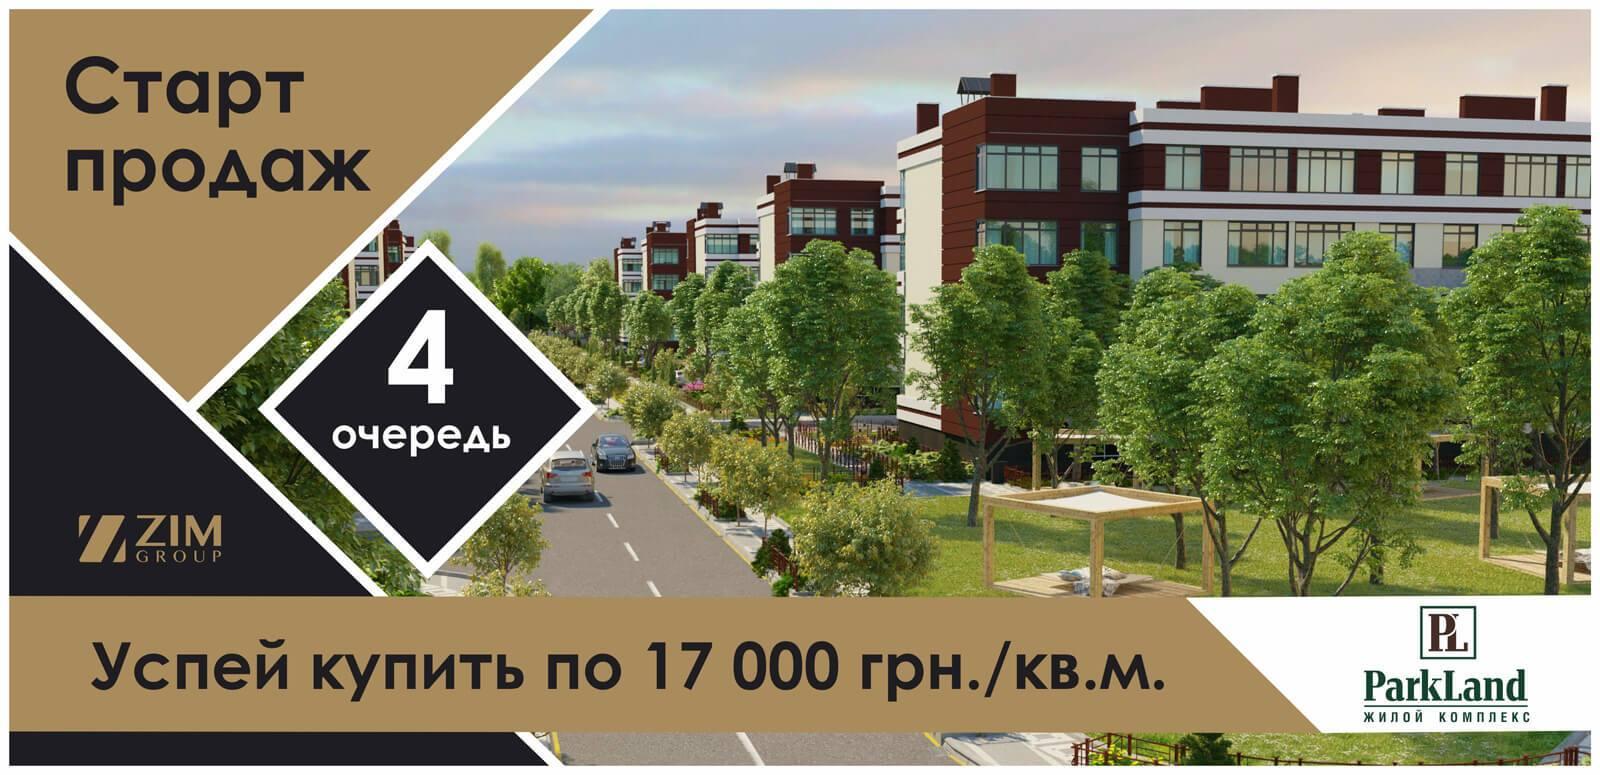 news-120617_ru